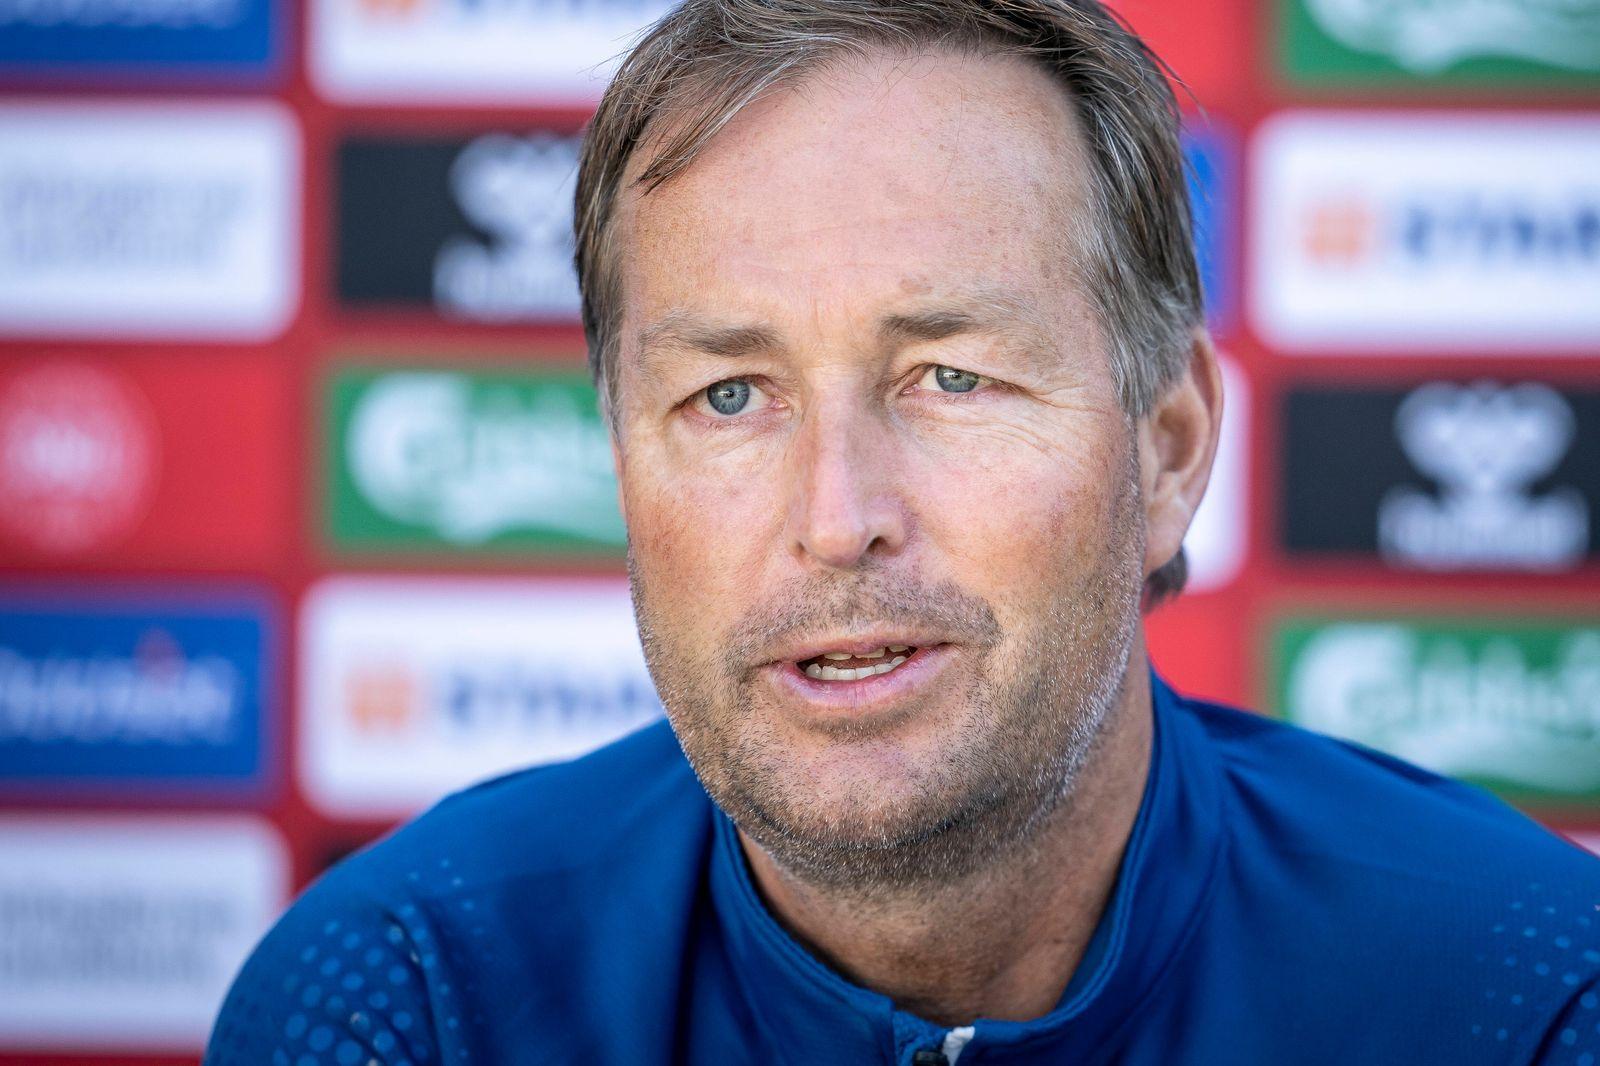 Landstraener Kasper Hjulmand taler med pressen foer landsholdets traening i Helsingoer, tirsdag den 15. juni 2021.. , El